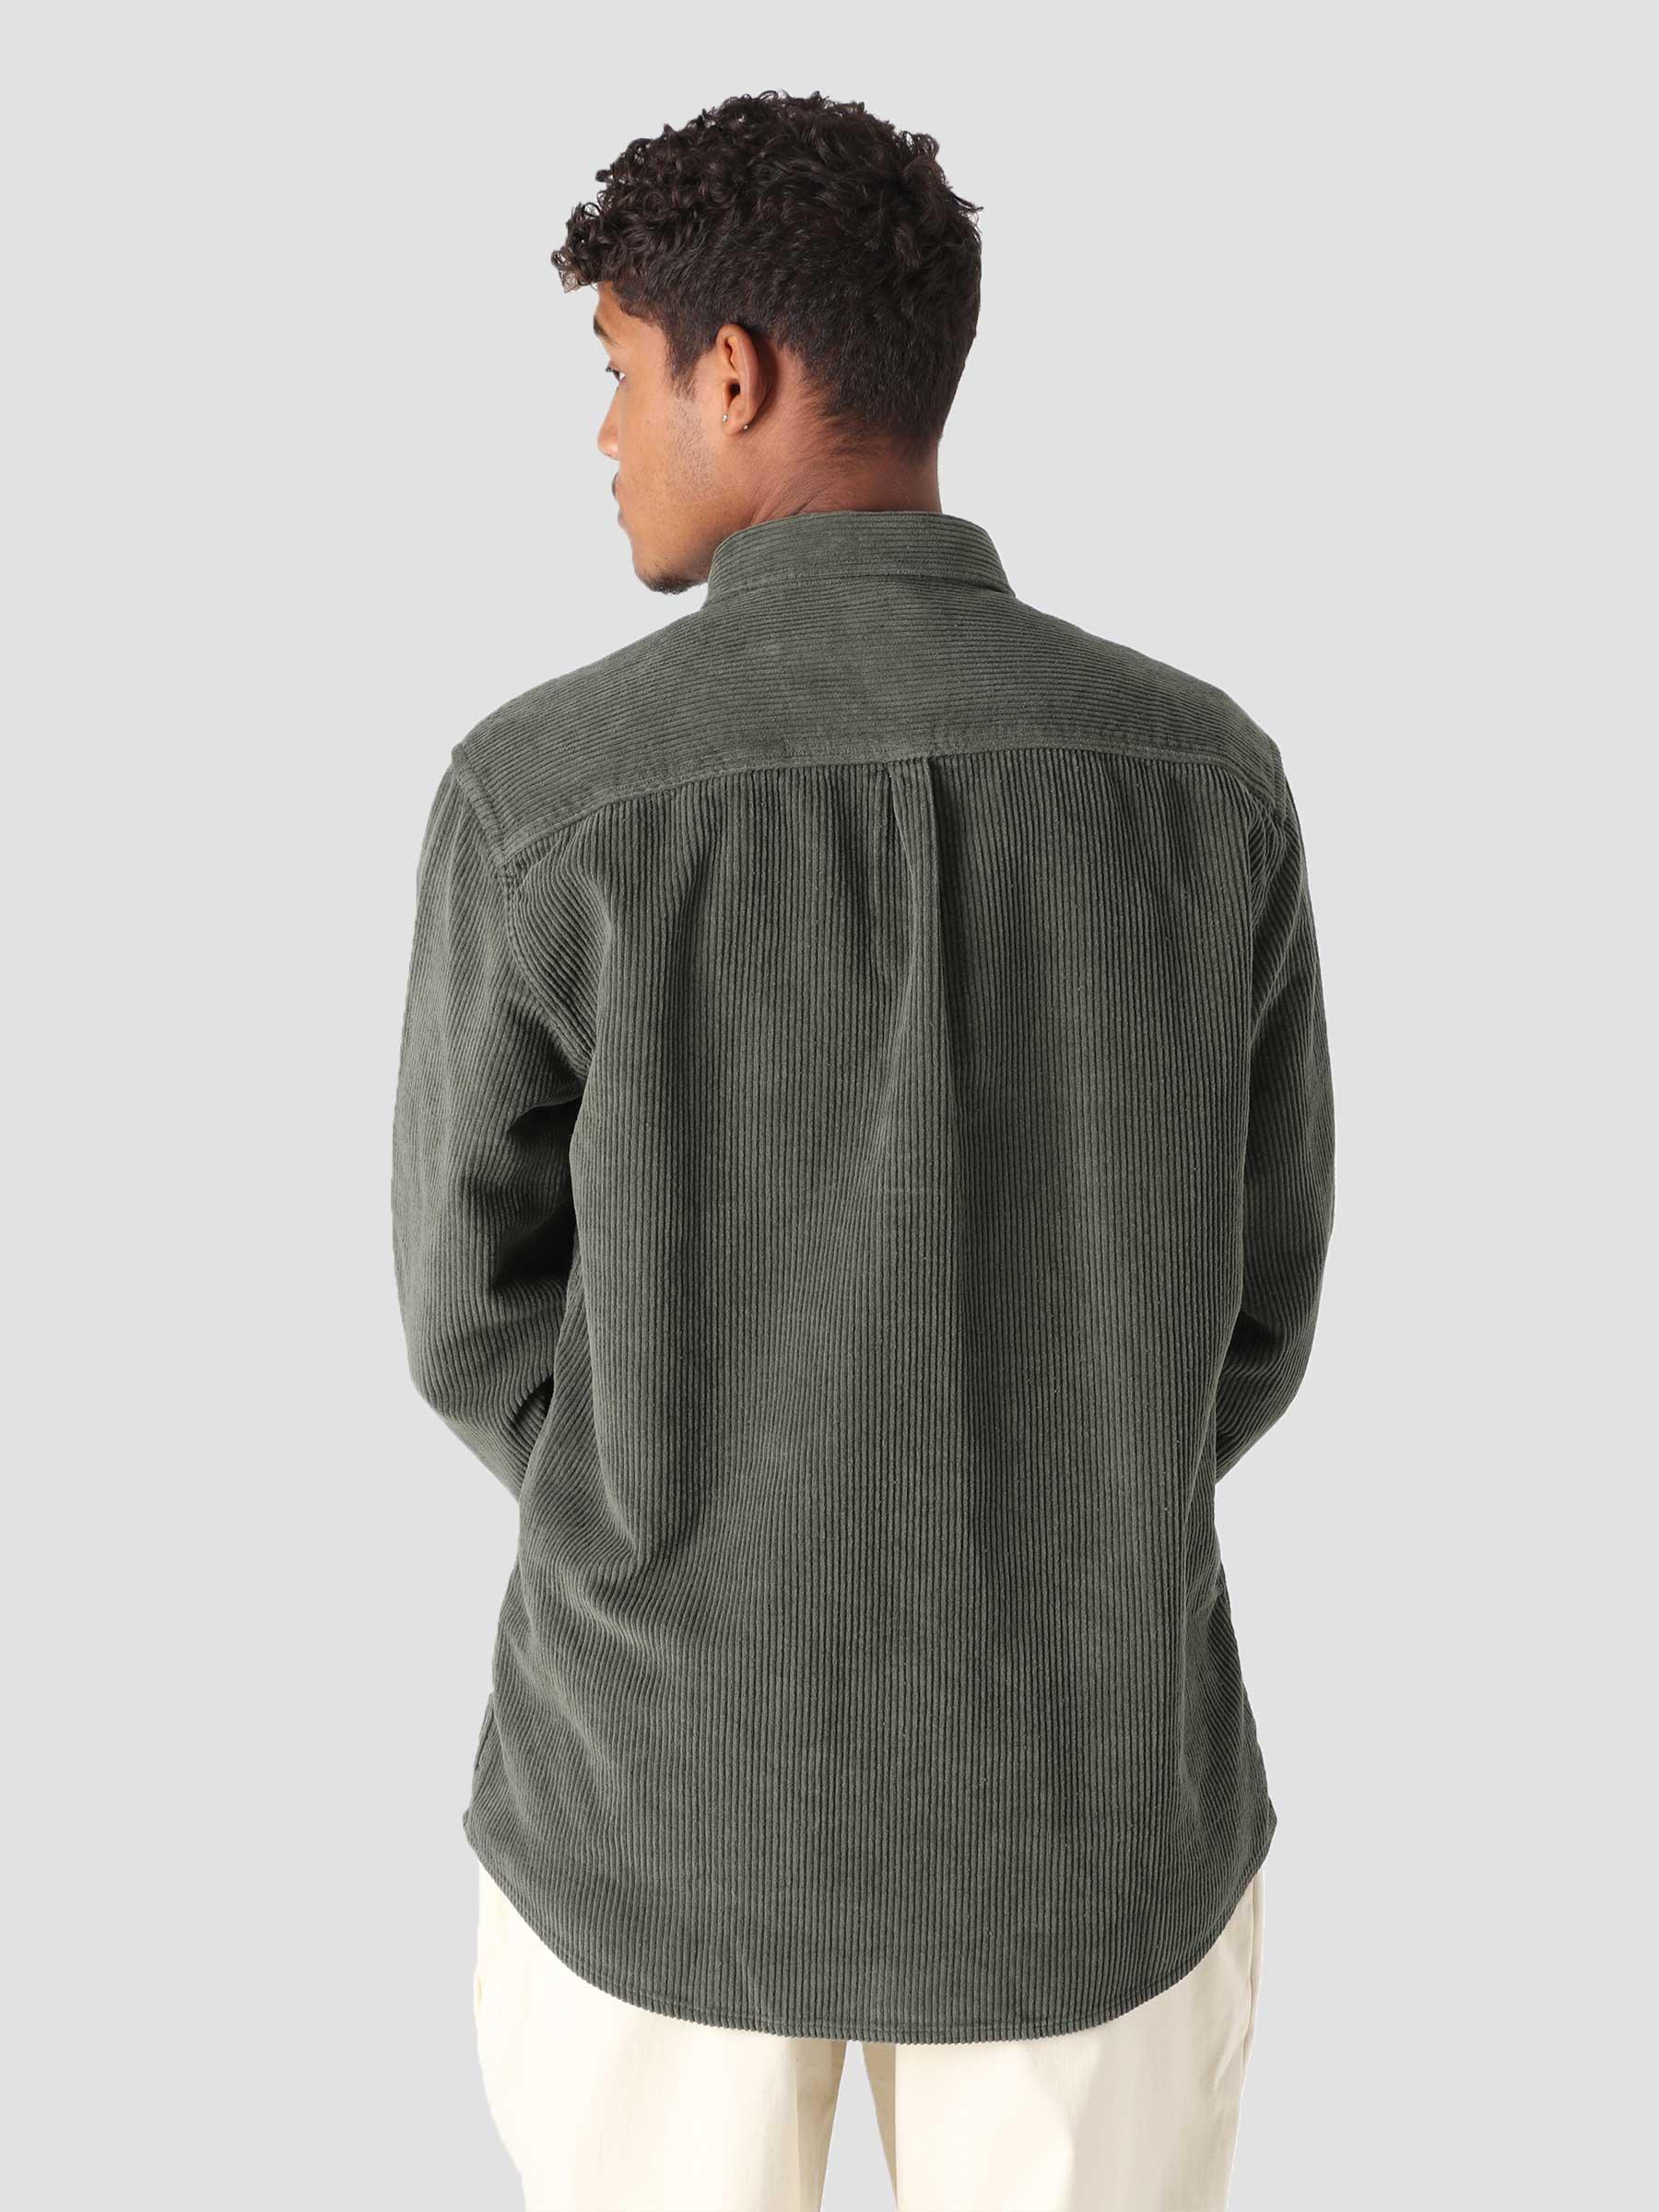 QB41 Cord Shirt Intense Olive